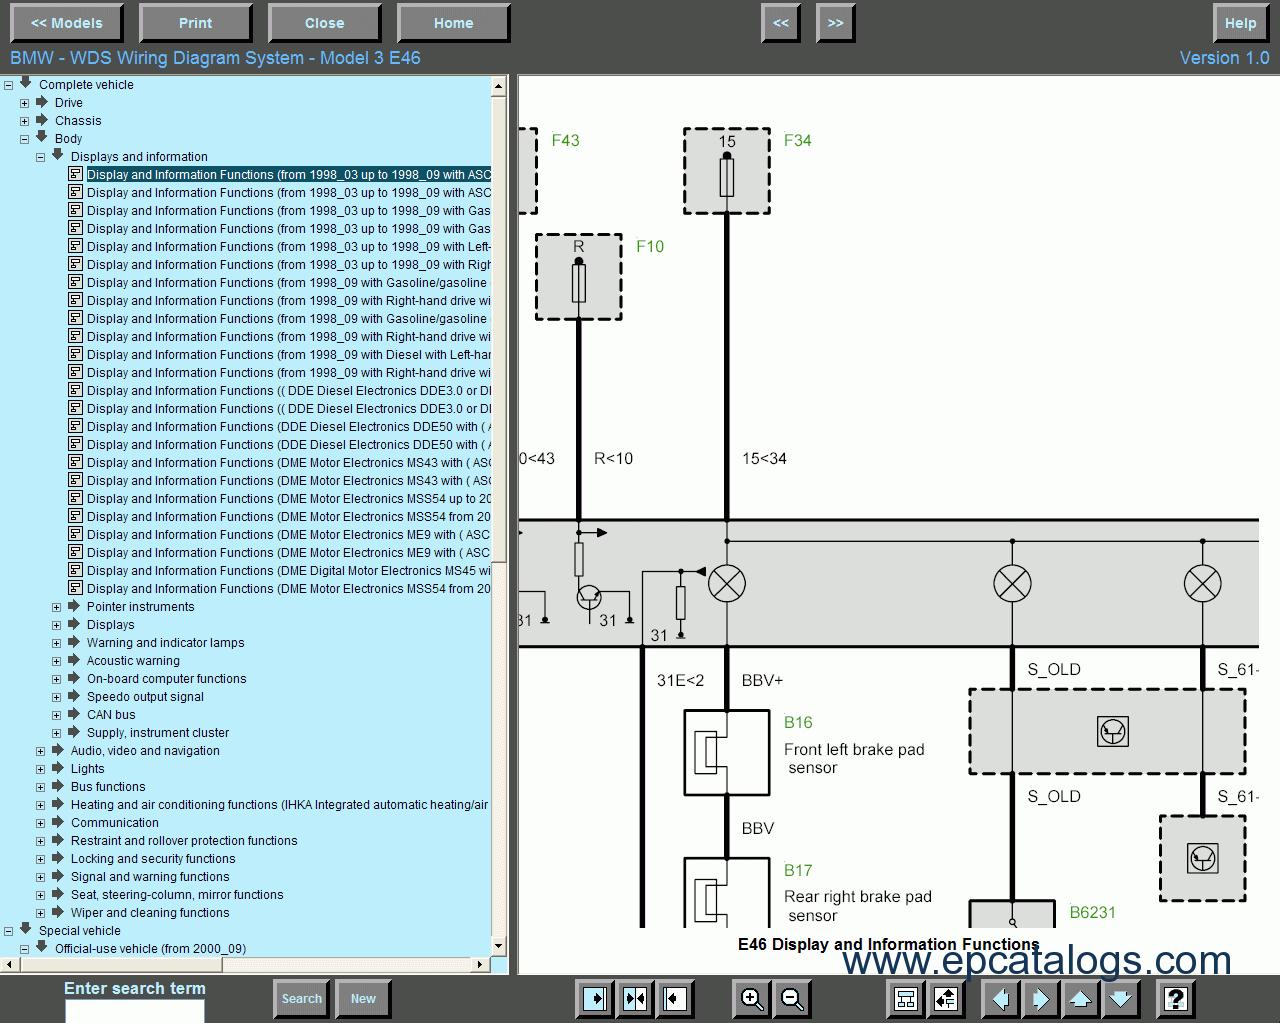 Wds Bmw Wiring Diagram System Model 5 E60 E61: Bmw Wiring Diagrams E61 At Imakadima.org